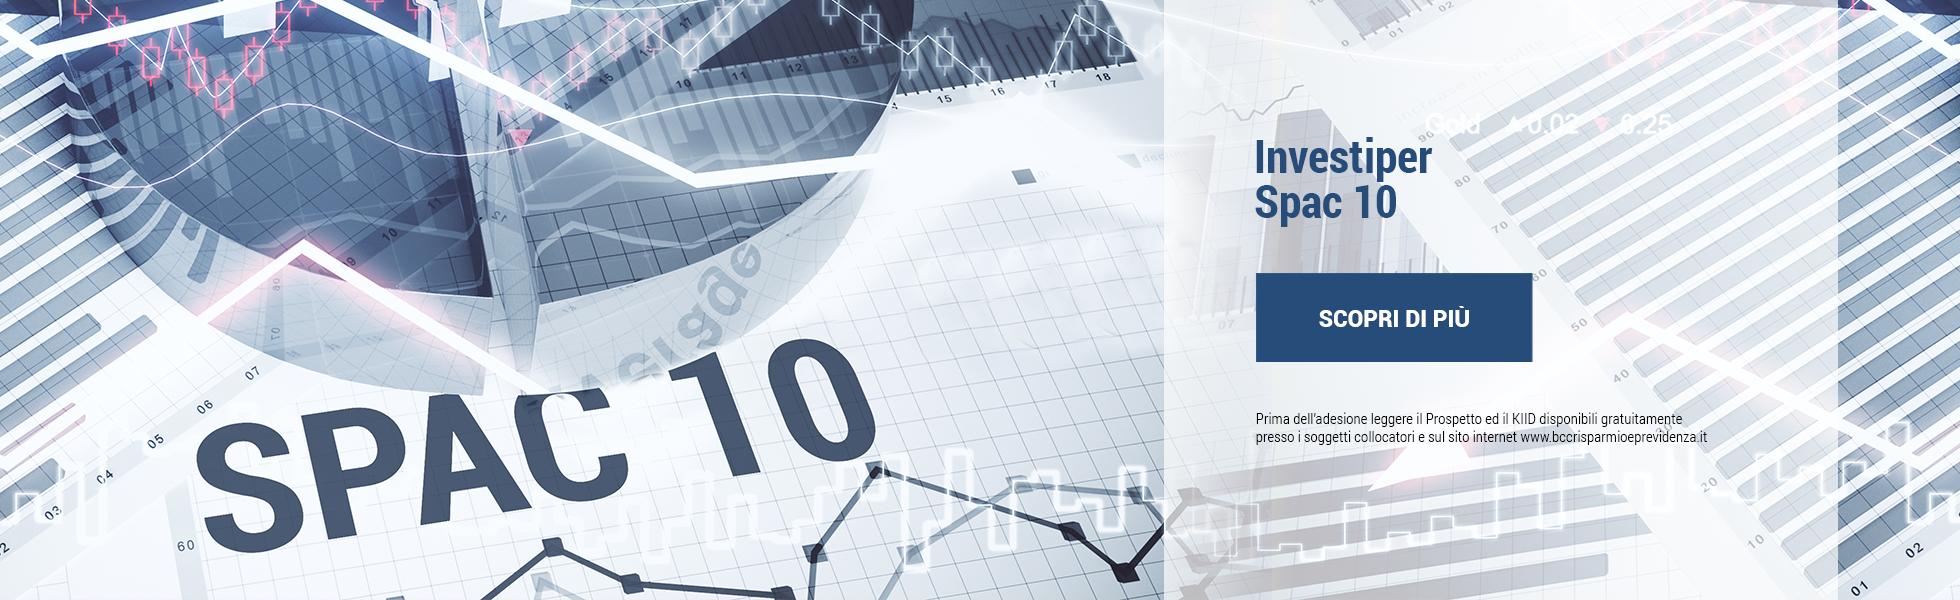 Spac 10 fondo Investiper